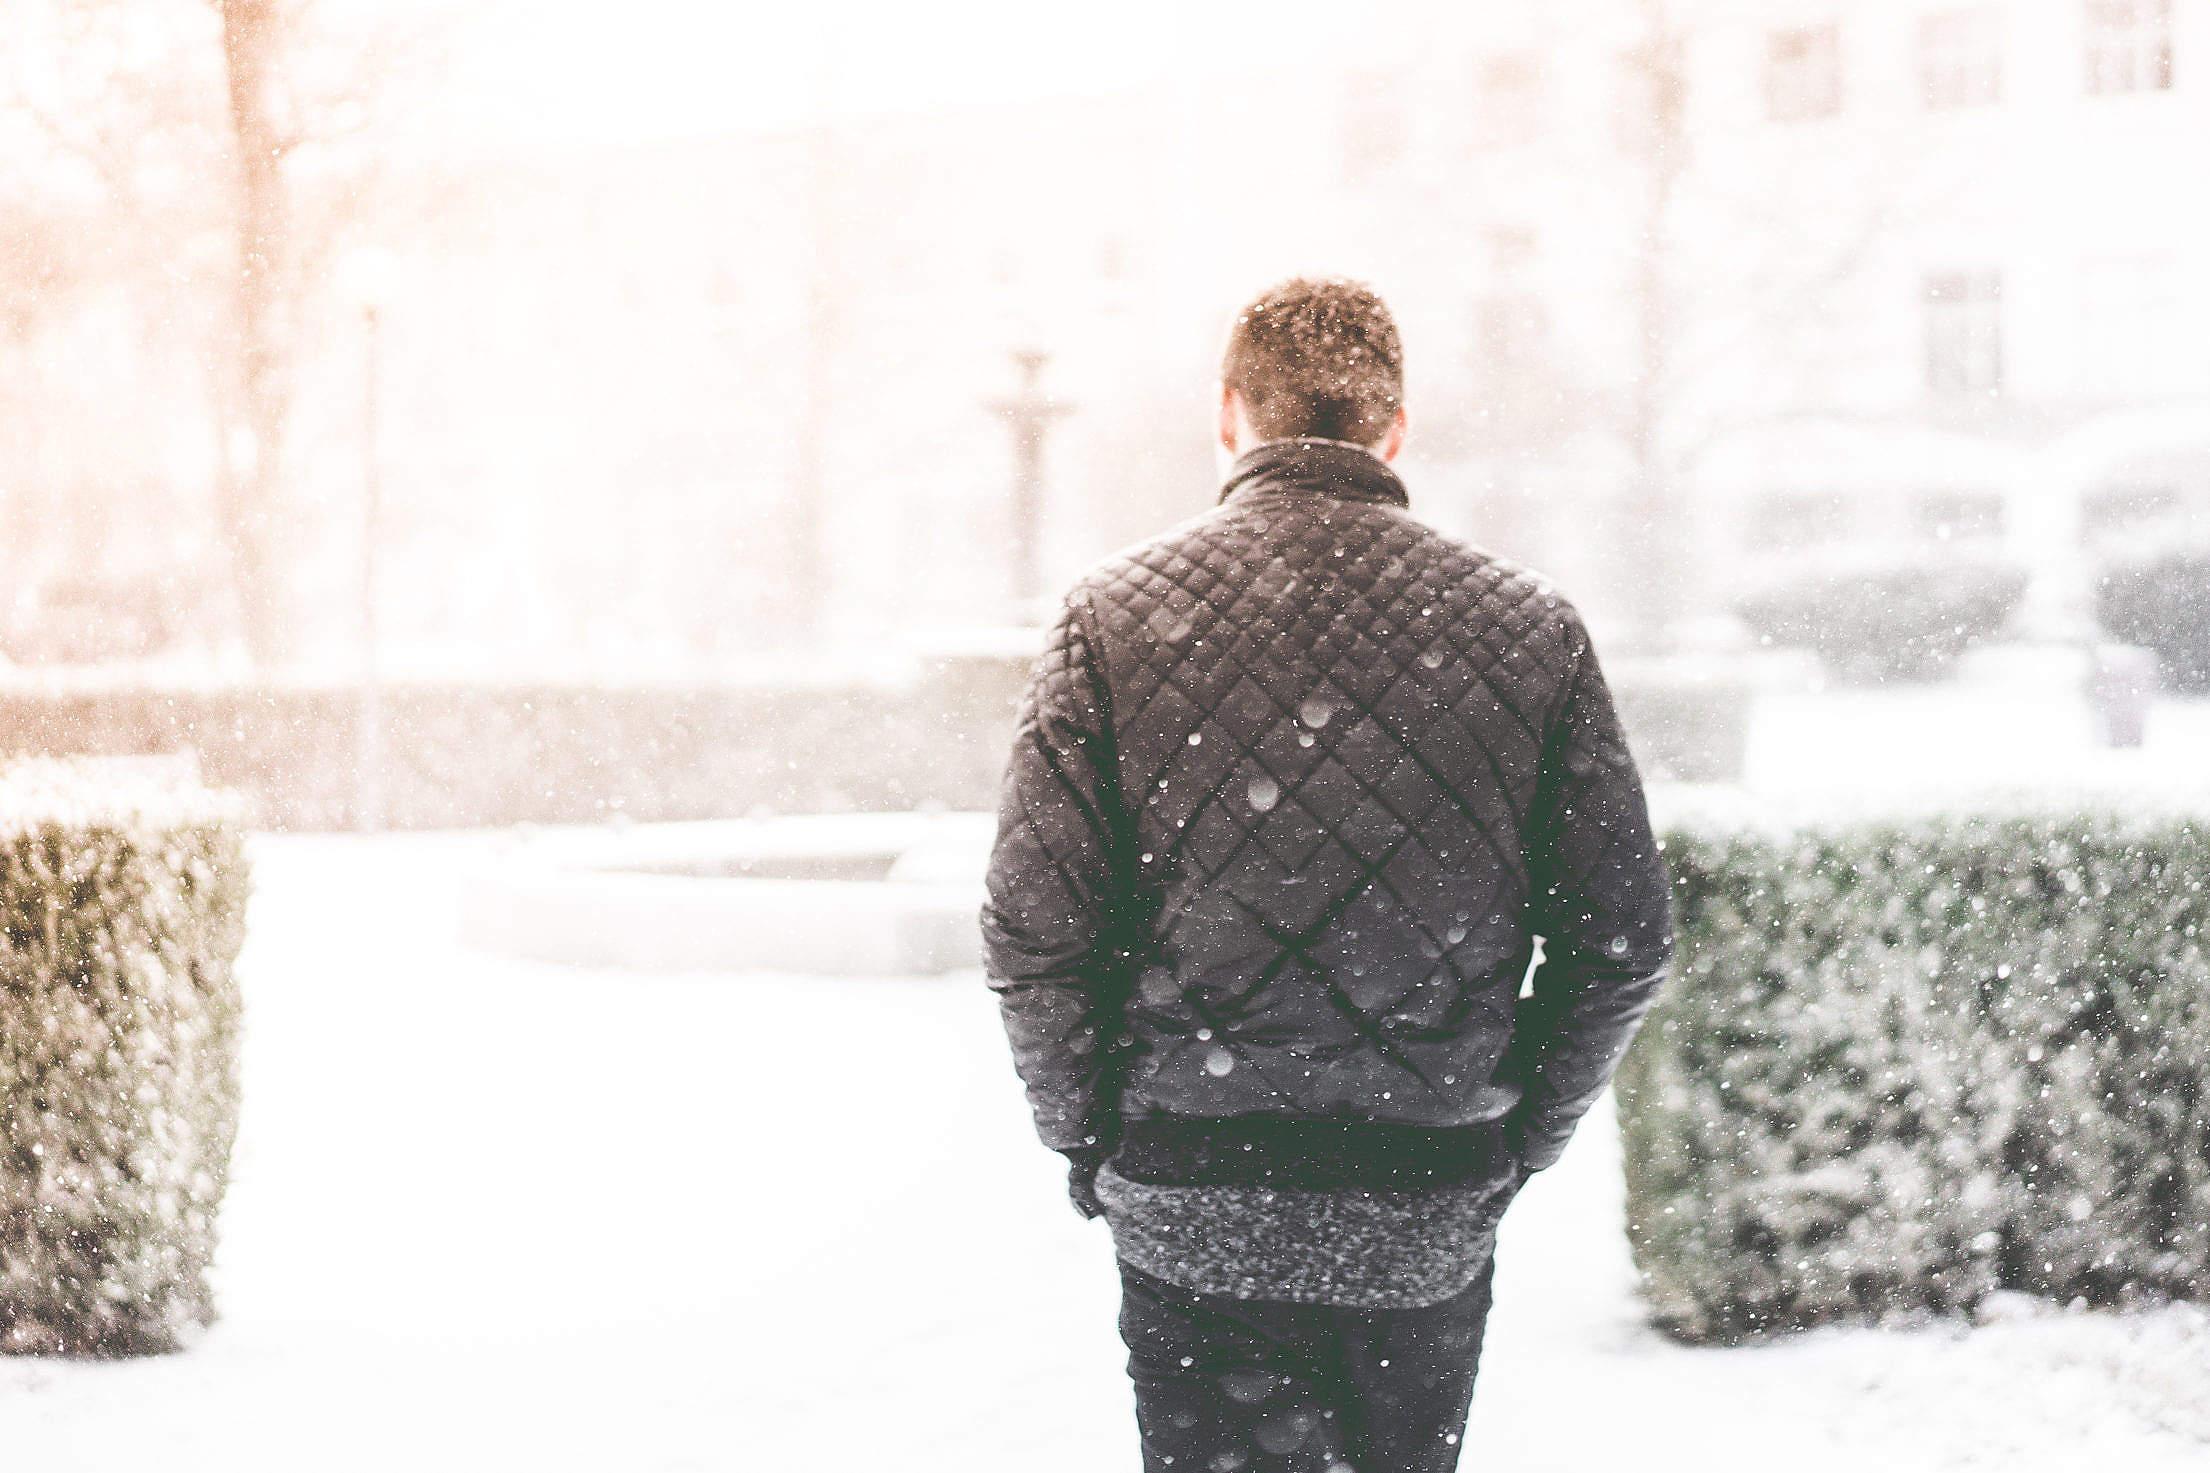 Man Walking in Snowfall Free Stock Photo